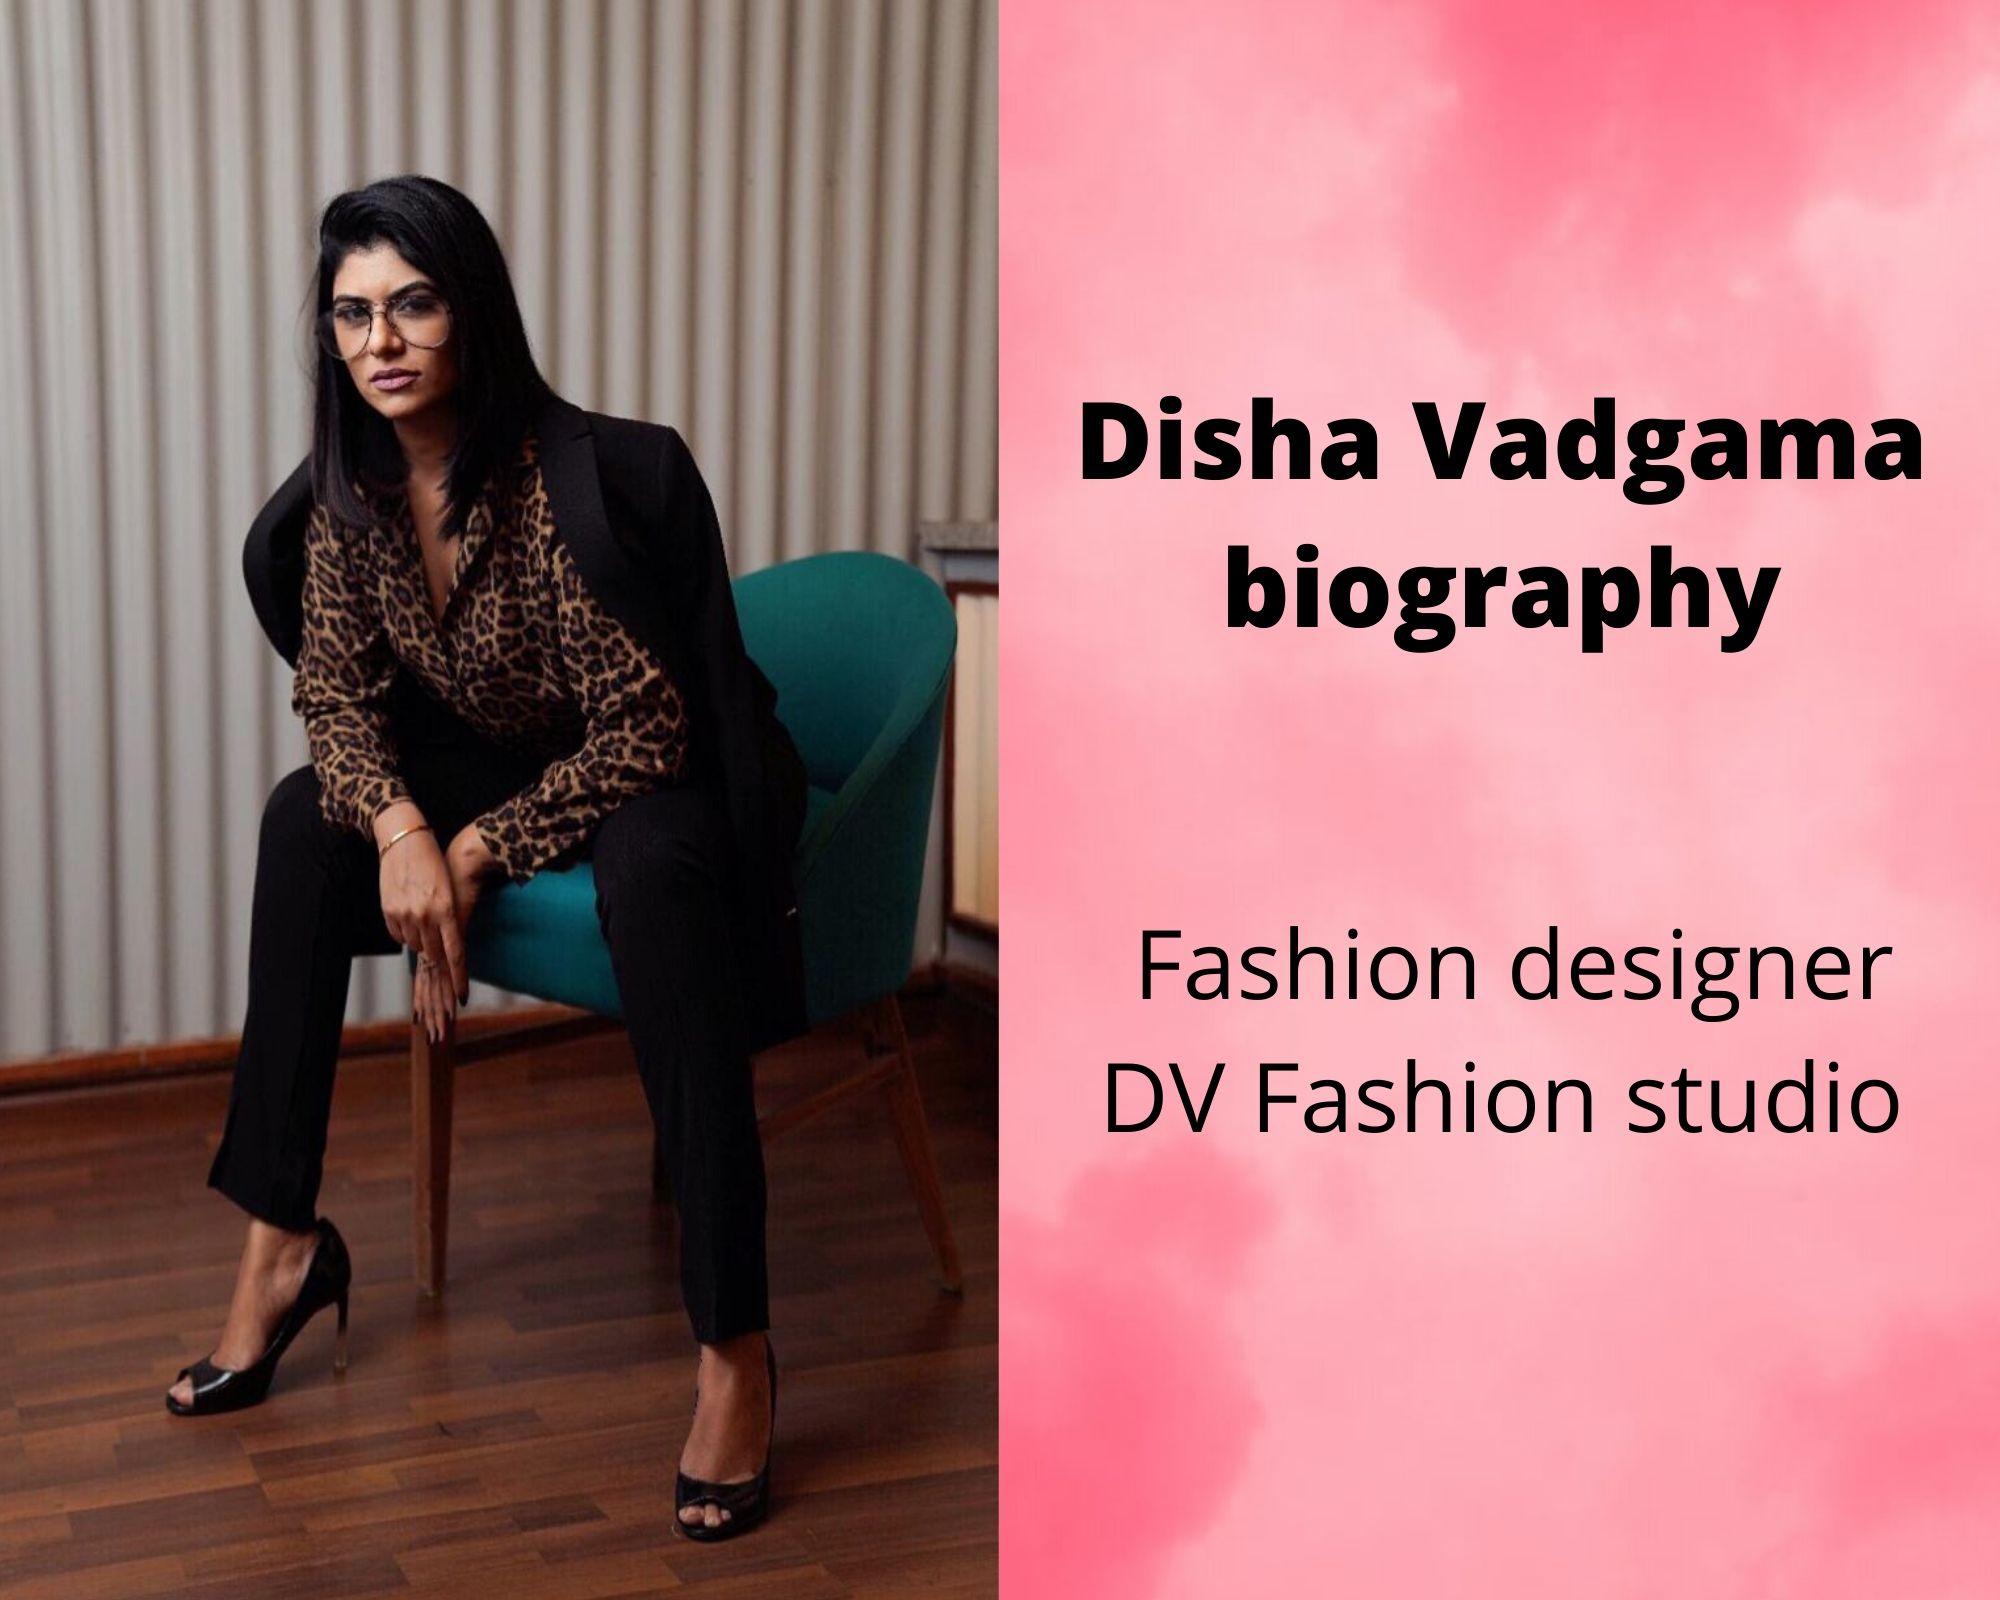 Disha Vadgama Biography | Fashion designer | DV Fashion studio